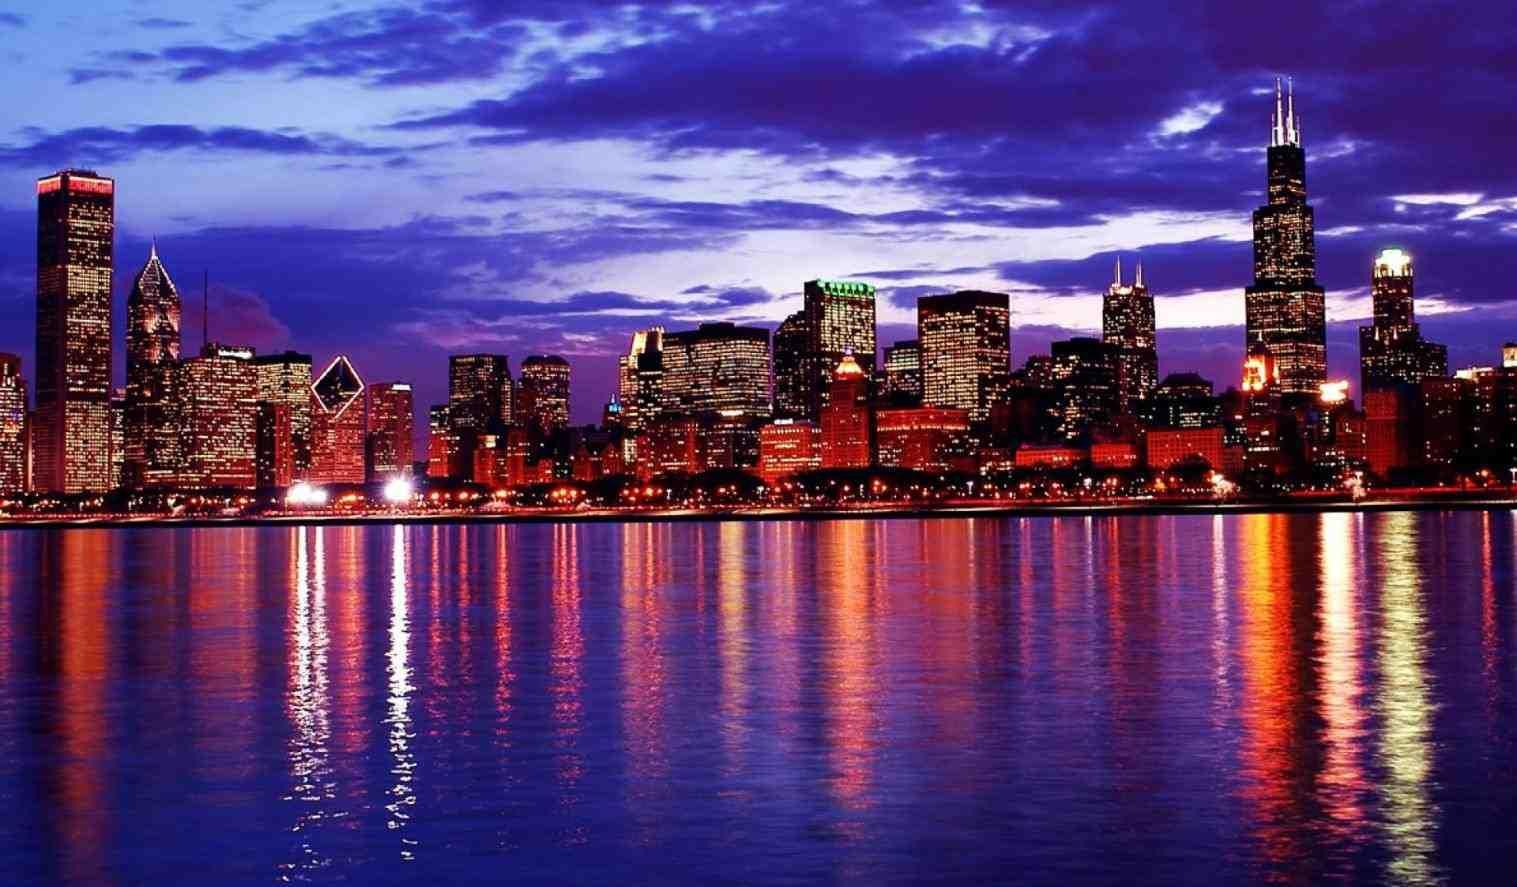 Chicago Skyline Wallpaper High Definition ZXe